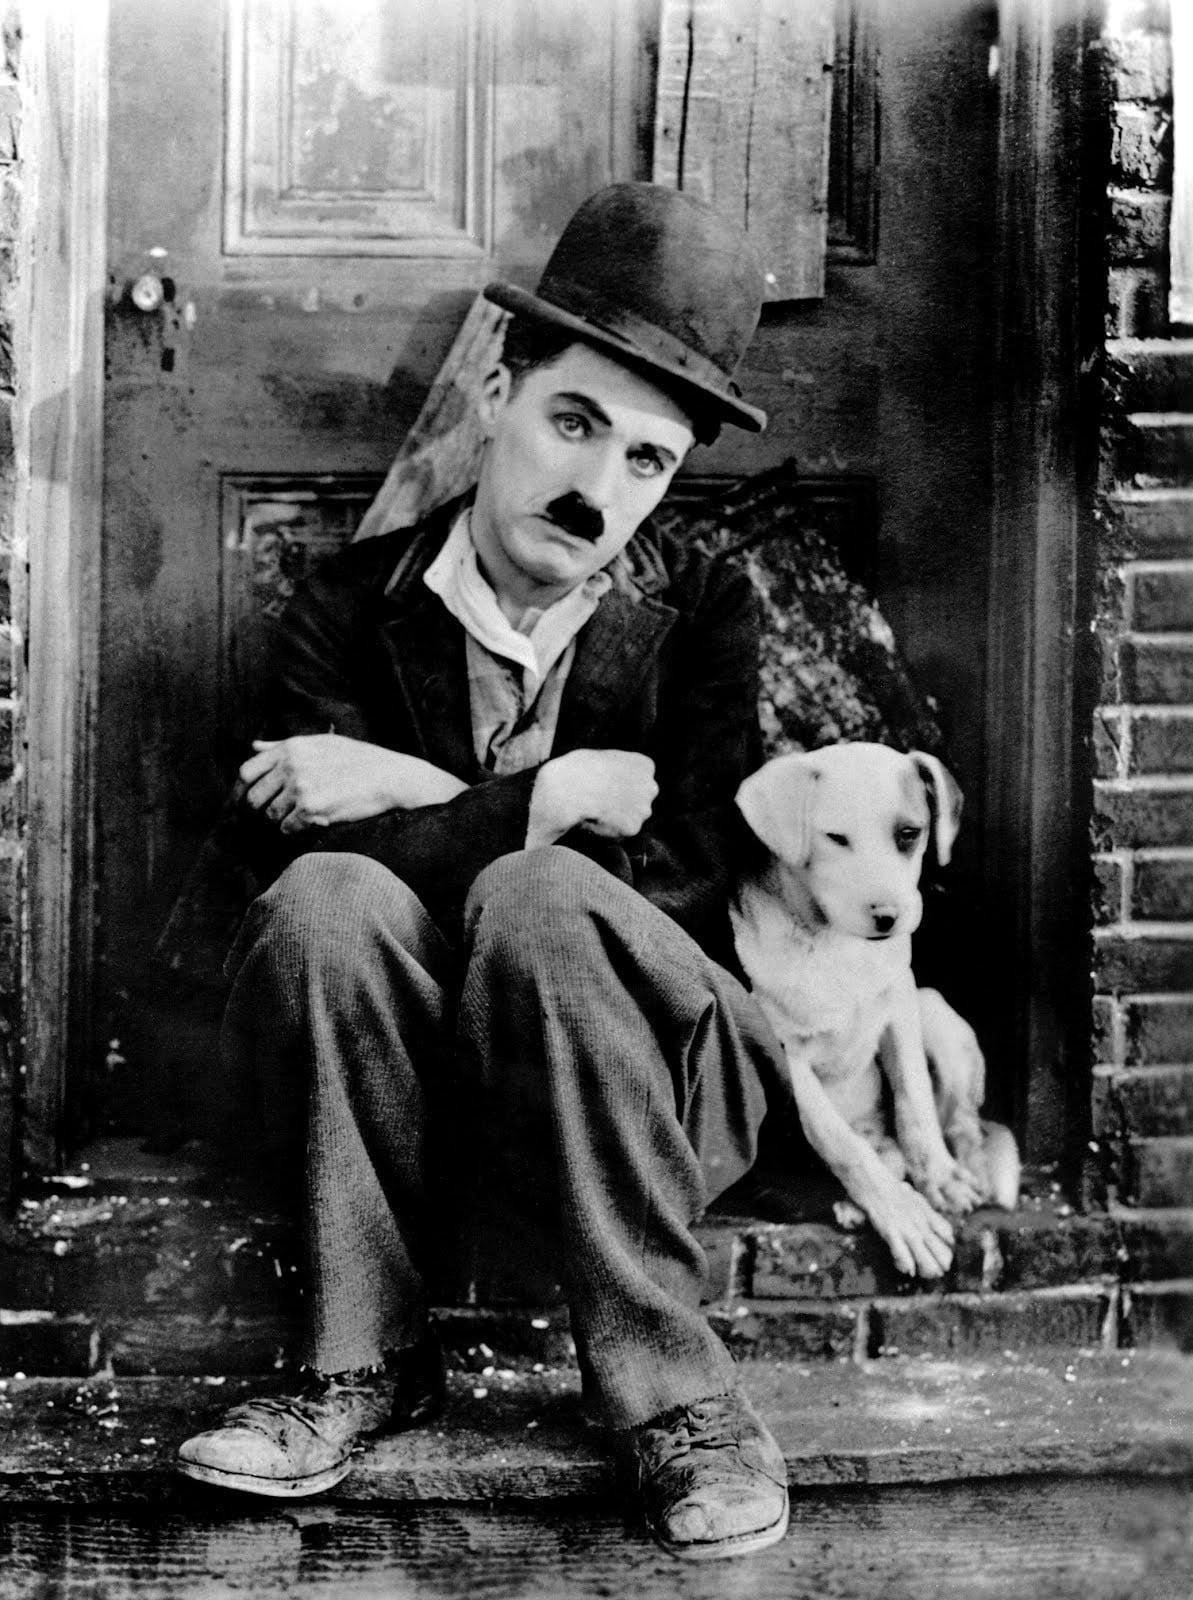 Charlie Chaplin Charlie Chaplin The Tramp HD wallpaper 1193x1600